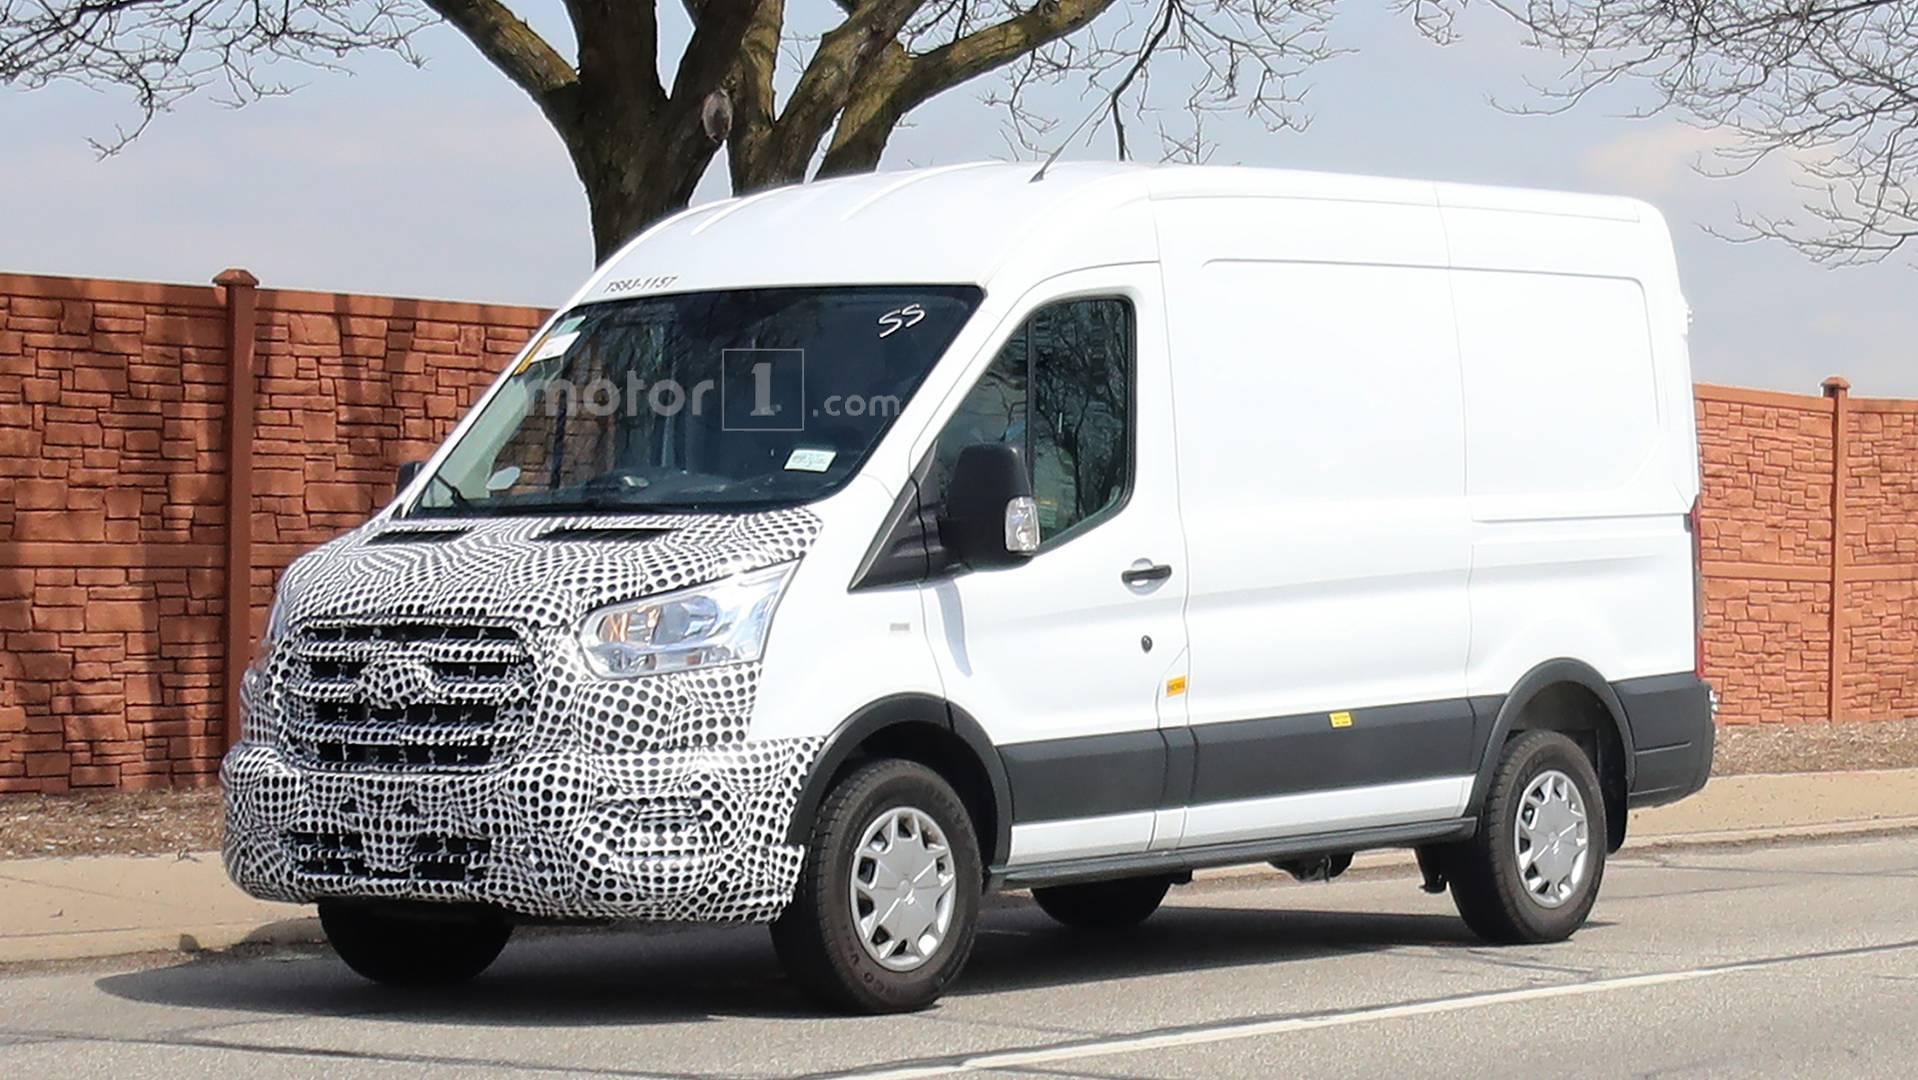 Spoiler alert 2019 ford transit spied still looks like van